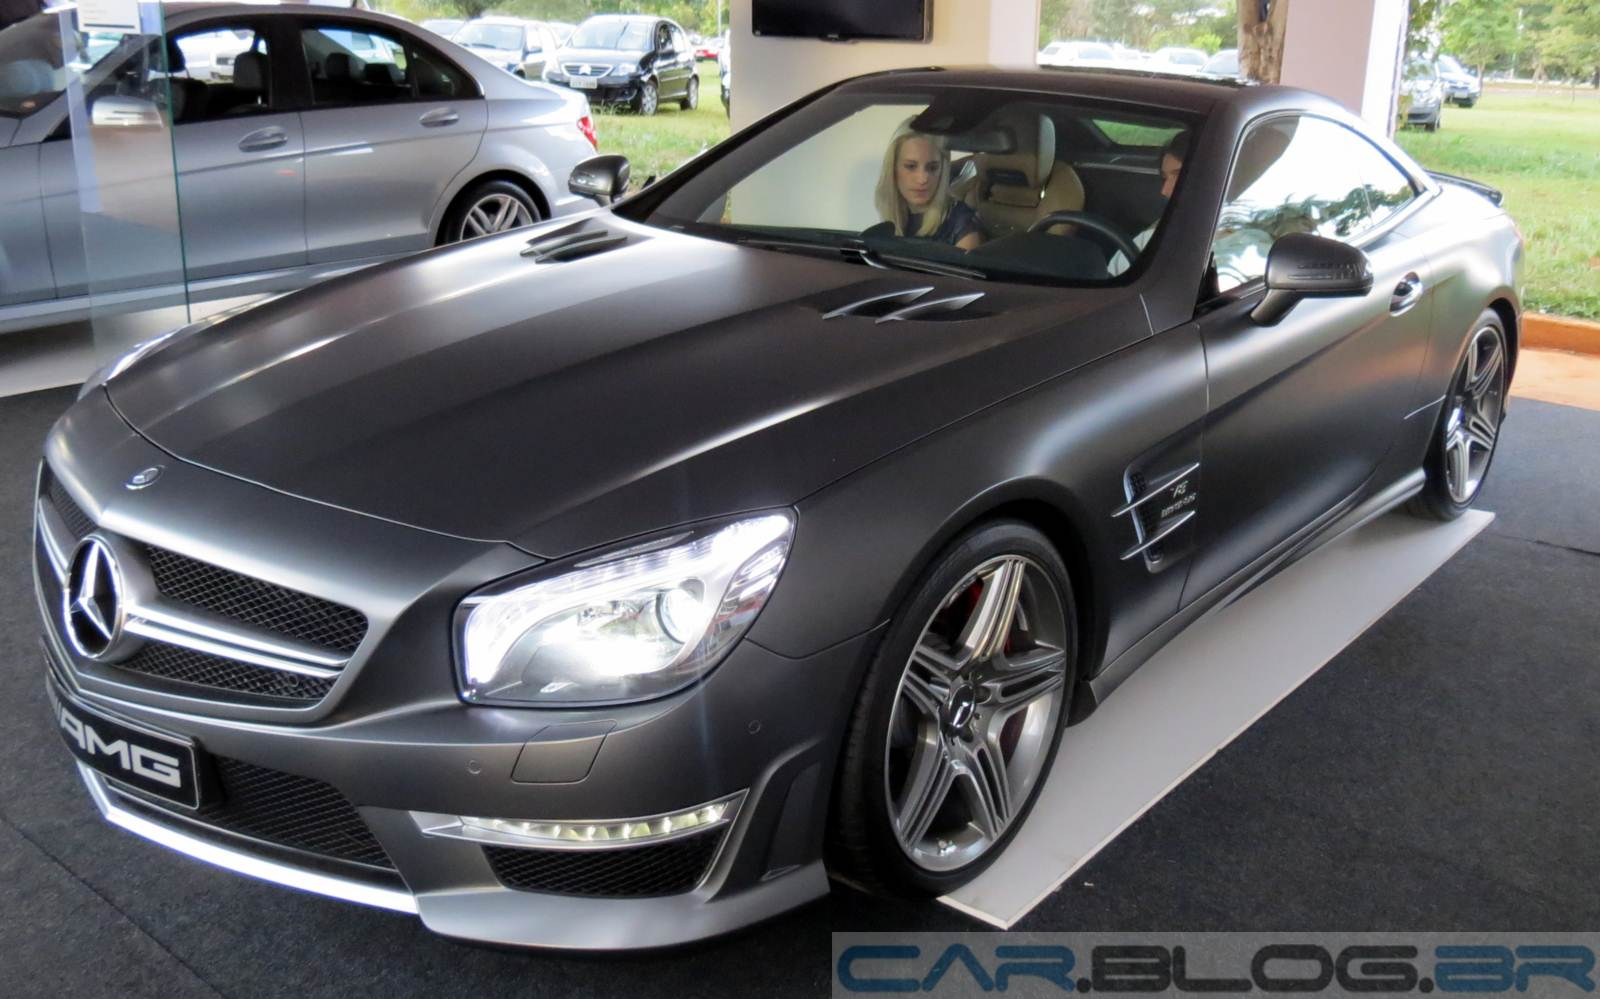 Mercedes benz sl 63 amg pre o v deo e especifica es for Mercedes benz in atlanta